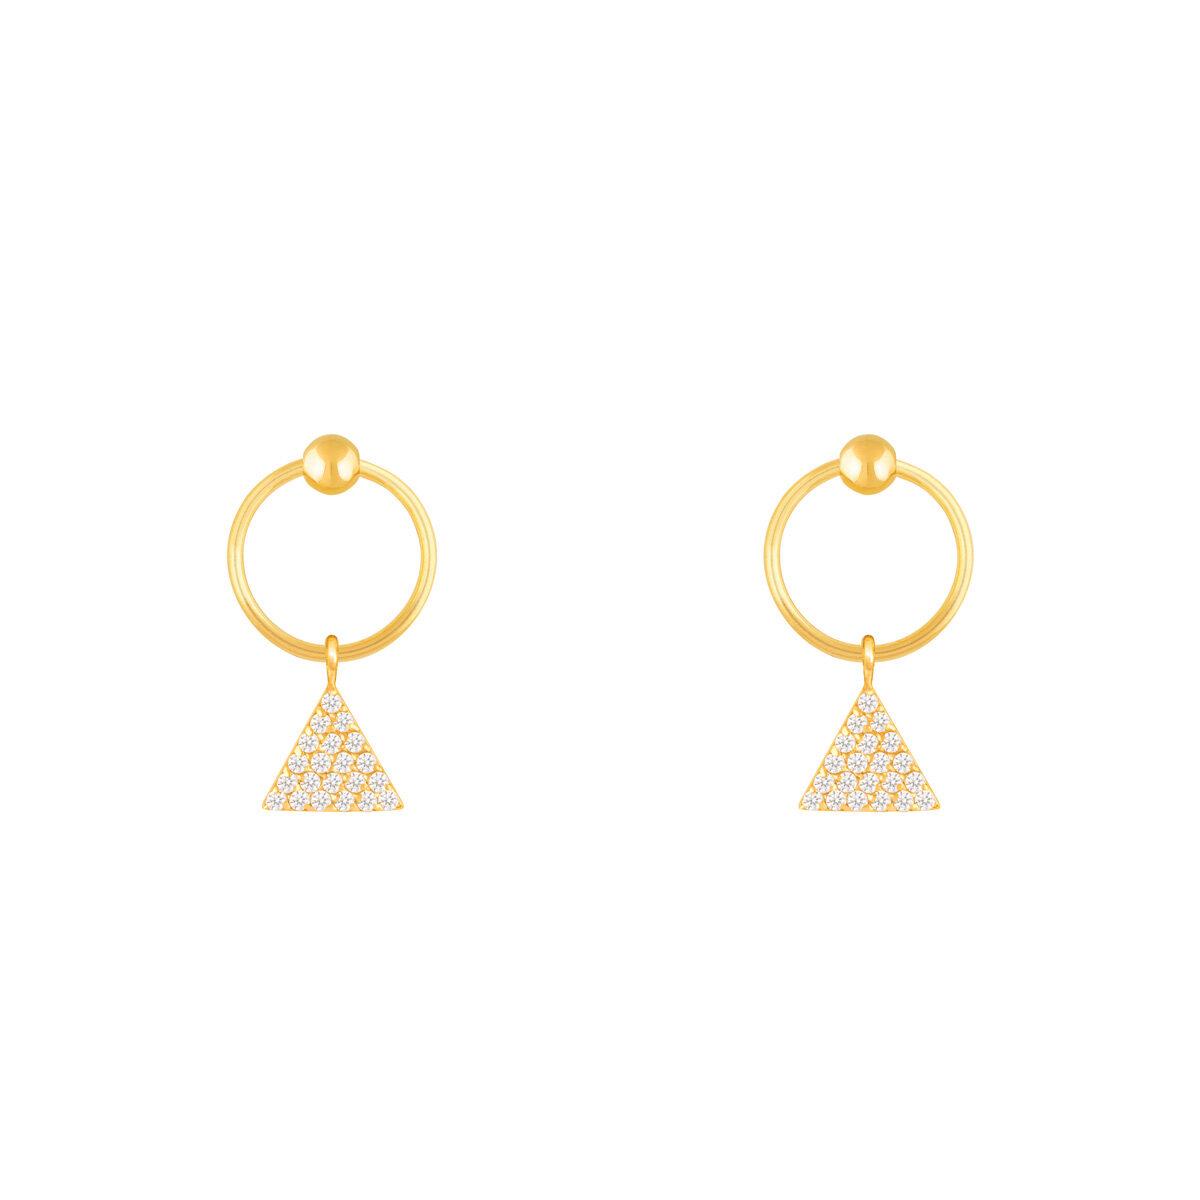 گوشواره طلا مثلث نگین دار و گوی